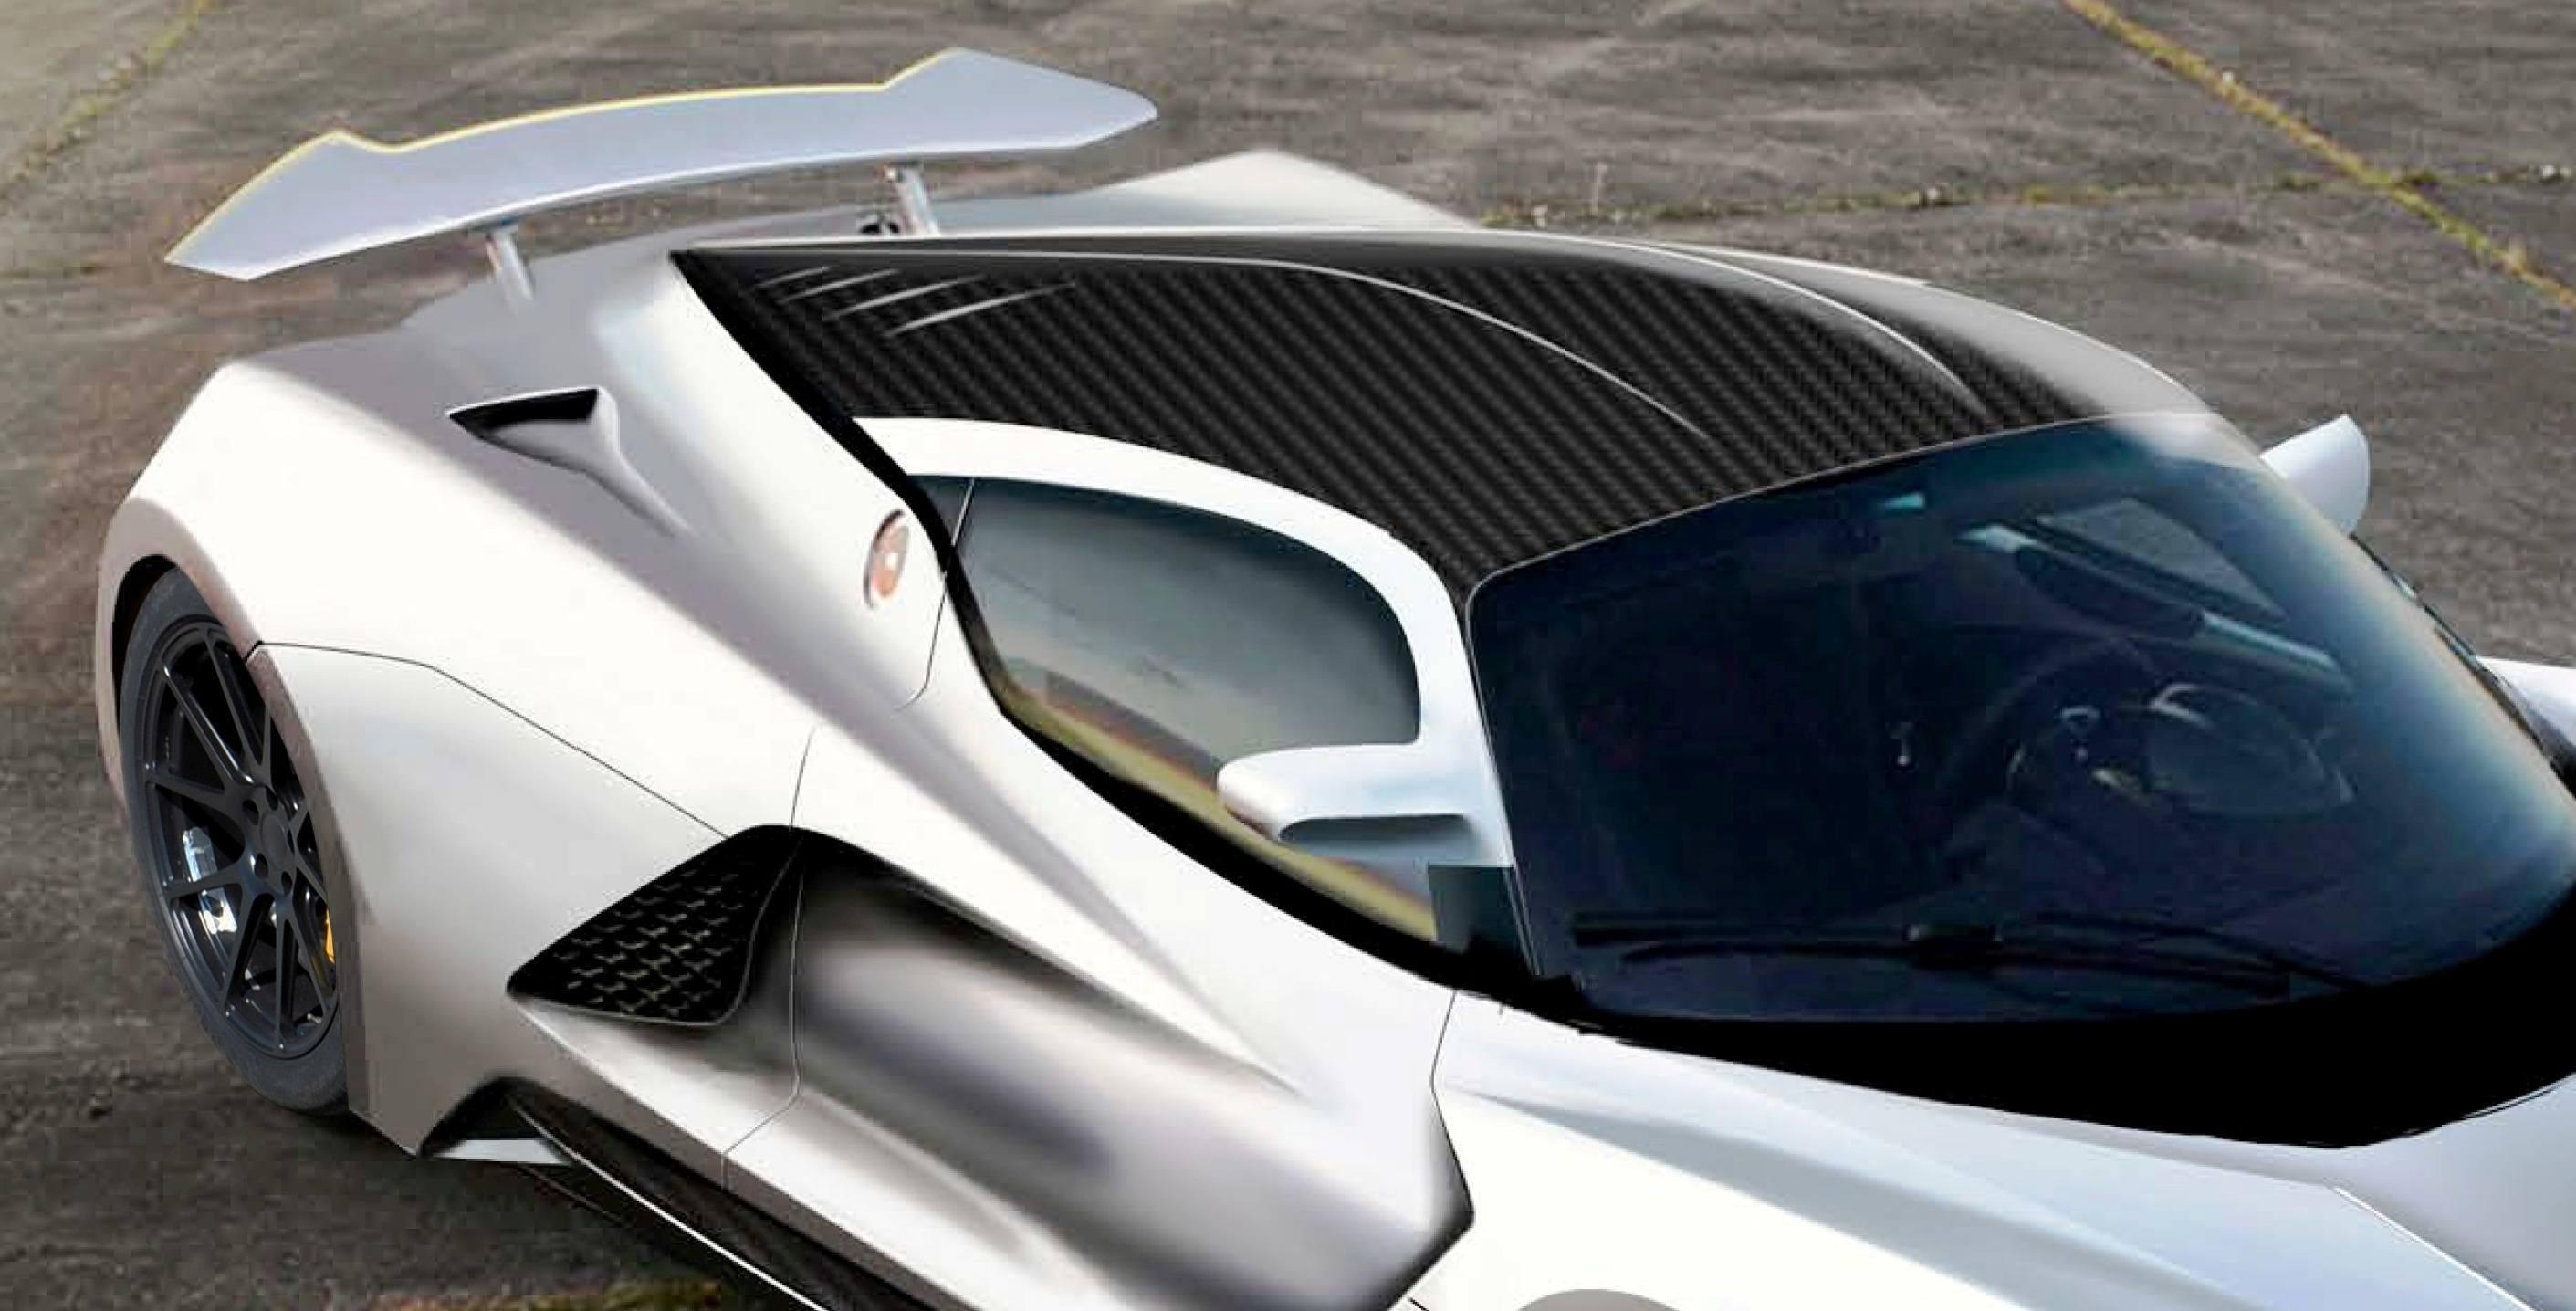 Fastest Car In The World Wallpaper 2015 2015 Hennessey Venom F5 Seeks Real 290mph Vmax Via New